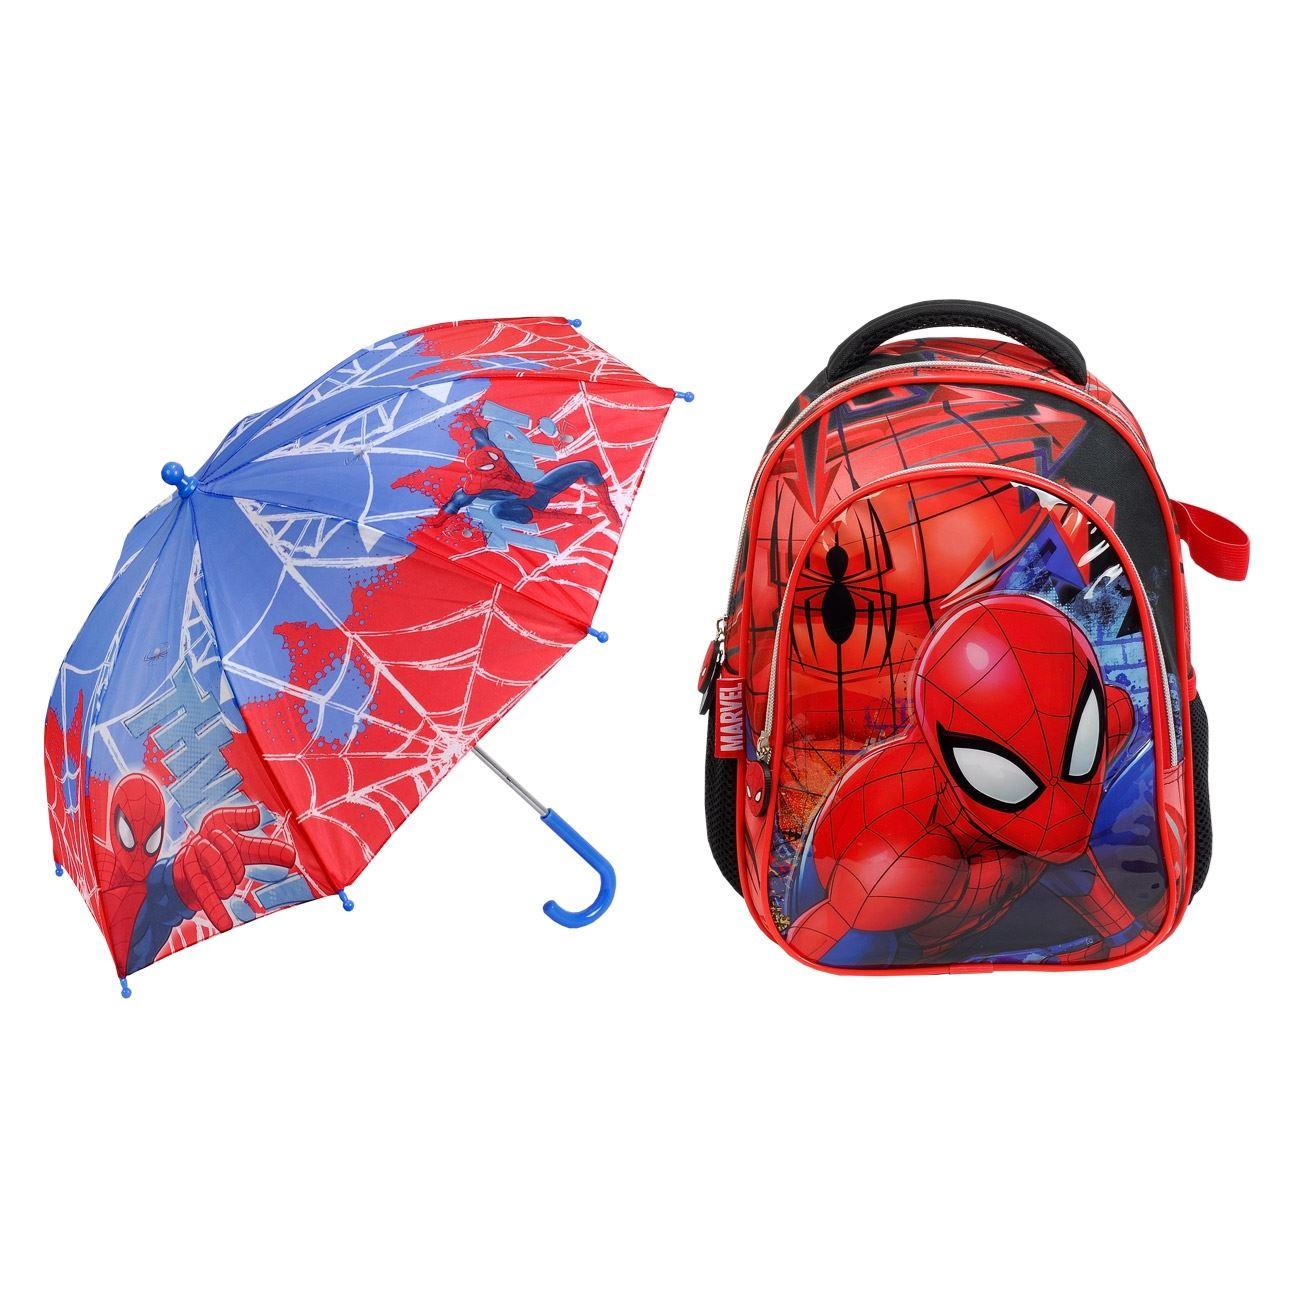 9a19c5951c Σχολική Τσάντα Νηπιαγωγείου   Ομπρέλα SPIDERMAN   Τσάντες ...